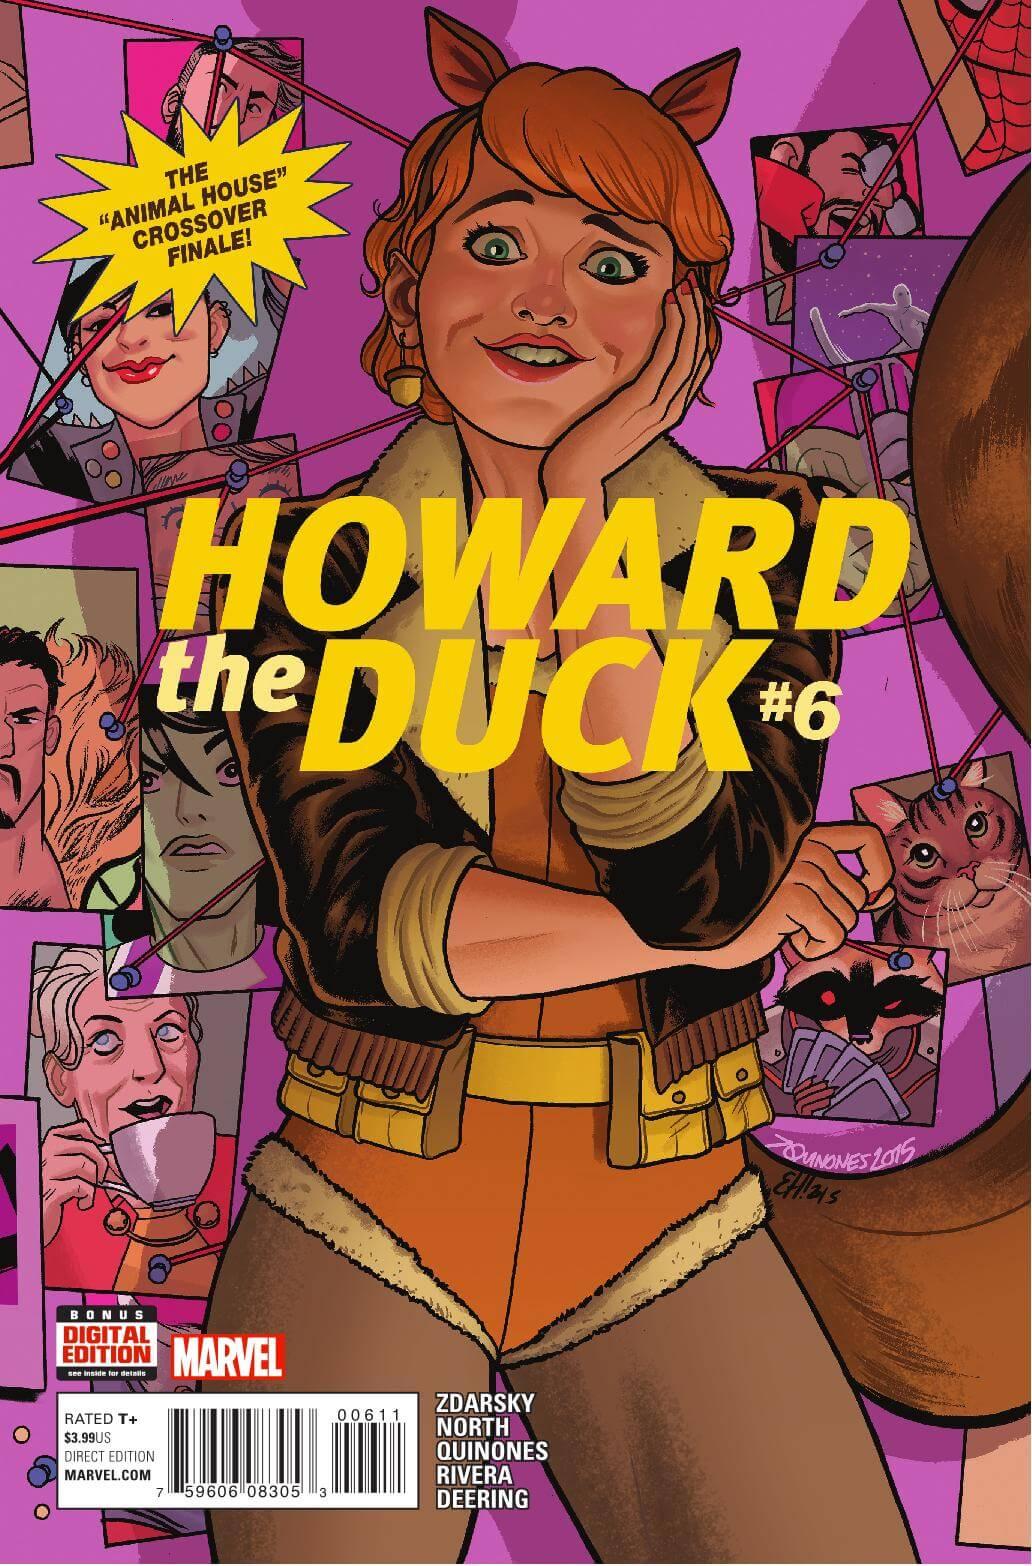 HOWARD2015B006_DC11_1